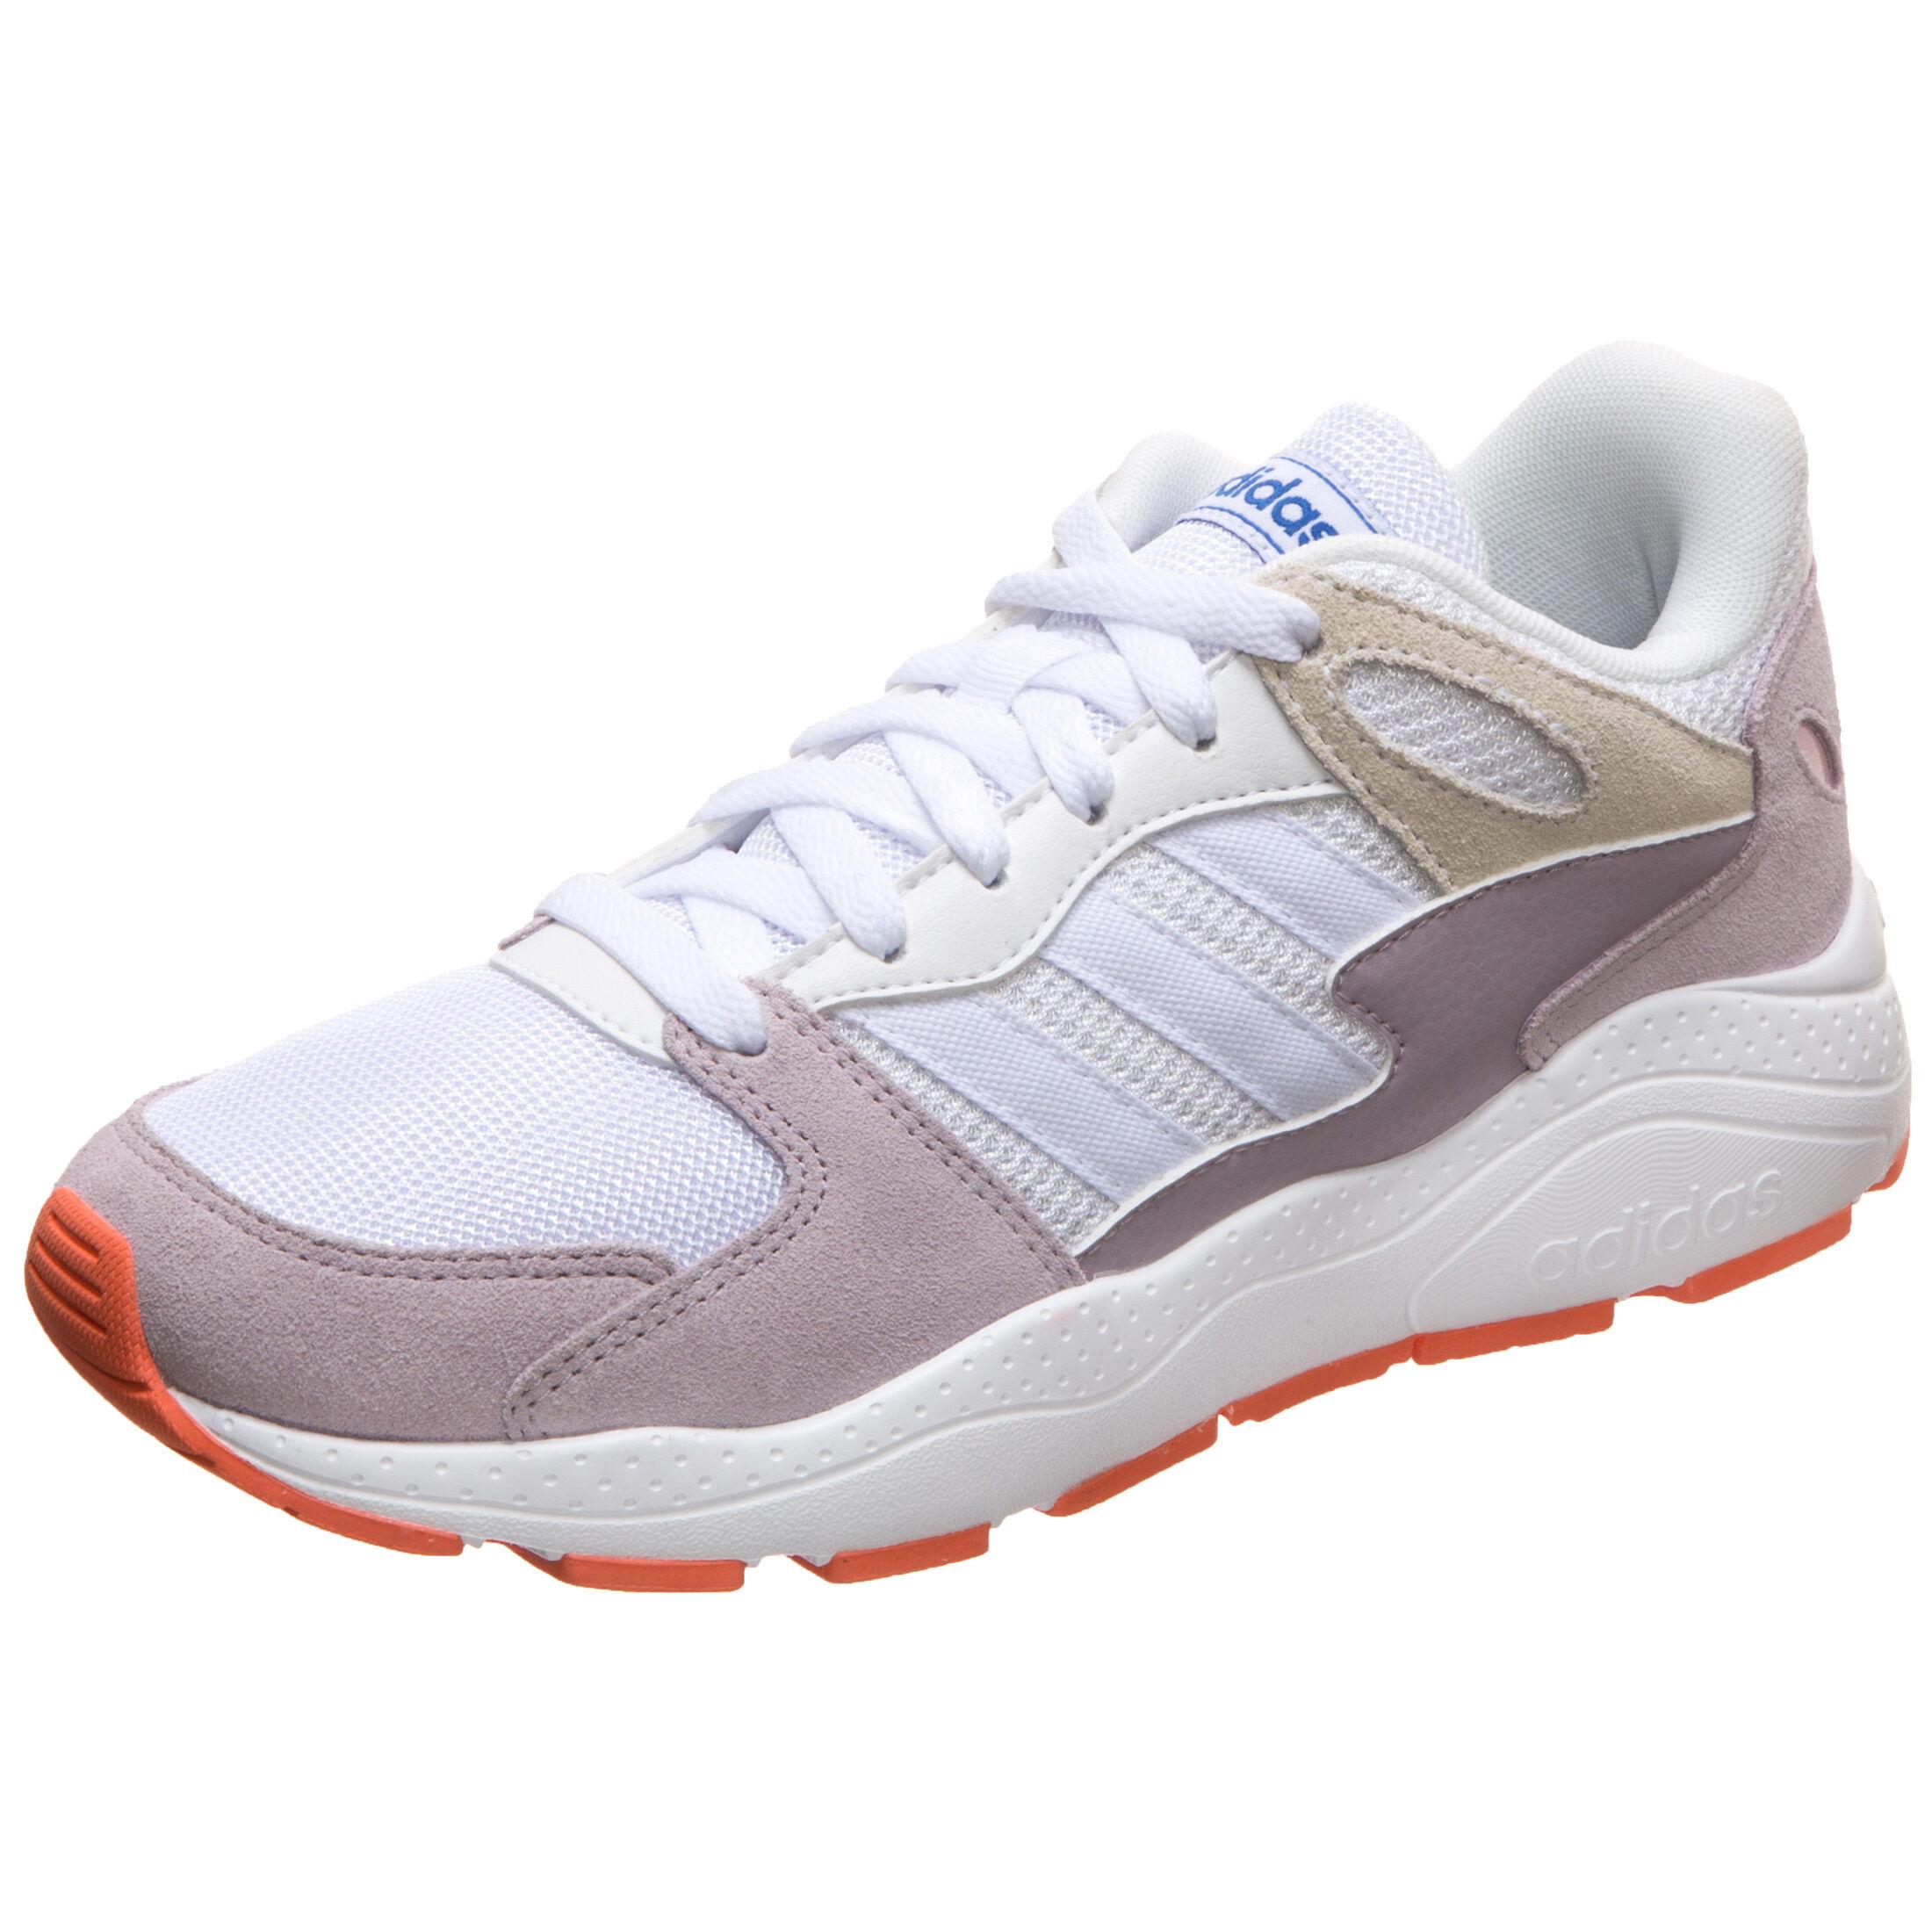 adidas Crazychaos Sneaker Damen bei OUTFITTER